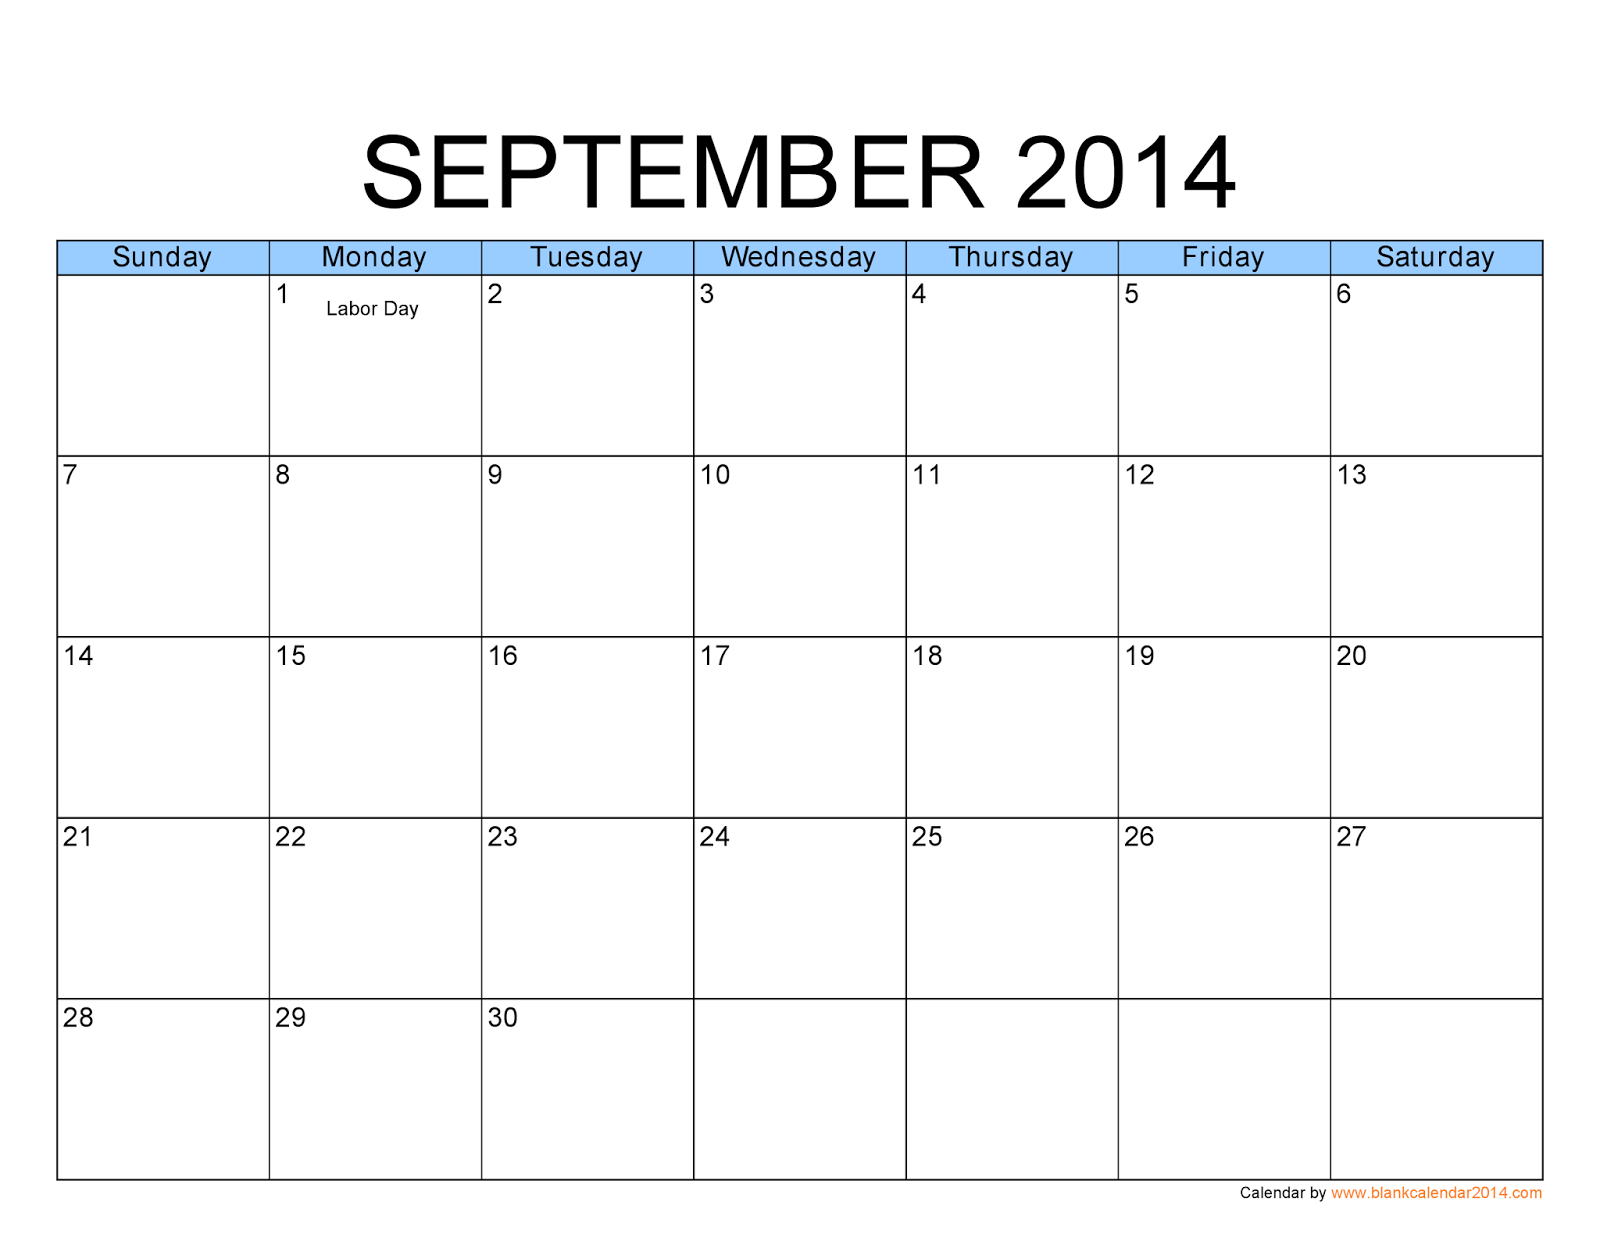 2014 Calendar Template For Word 2010 2014 2015 Calendar Free Printable Two Year Word Calendars Free Printable Calendar Free Printable Calendar September